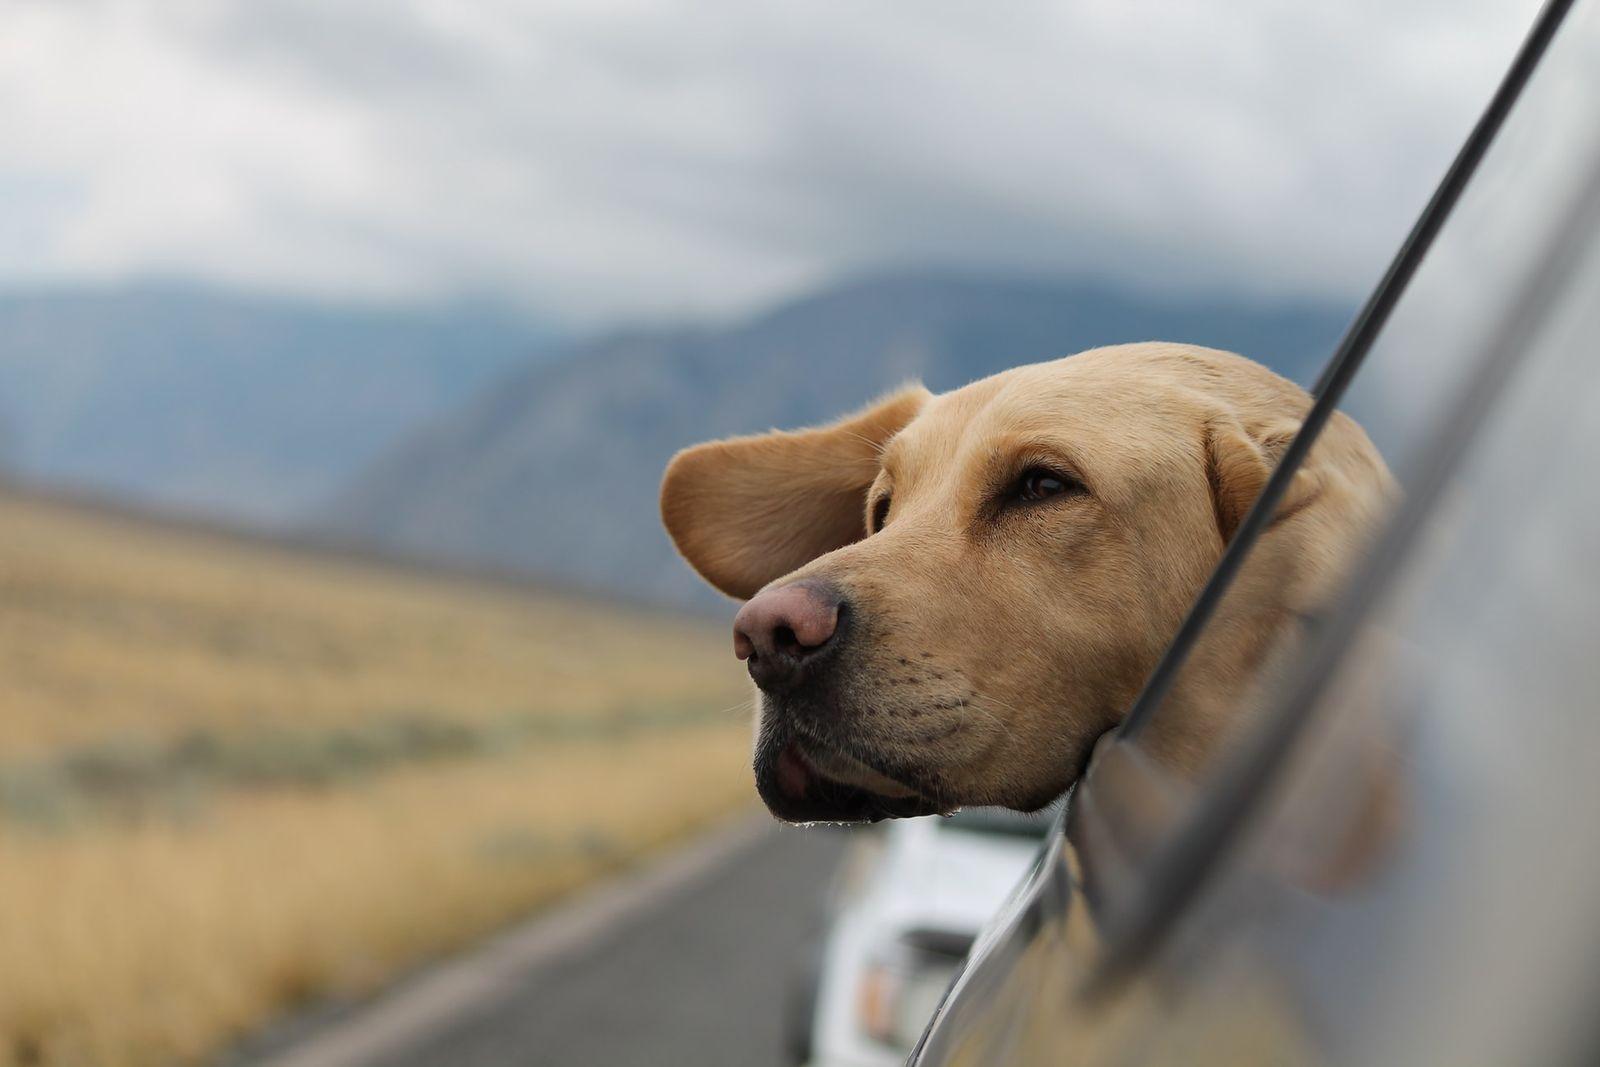 Vetster Telemedicine & Pet Wellness - Here when your pet needs us